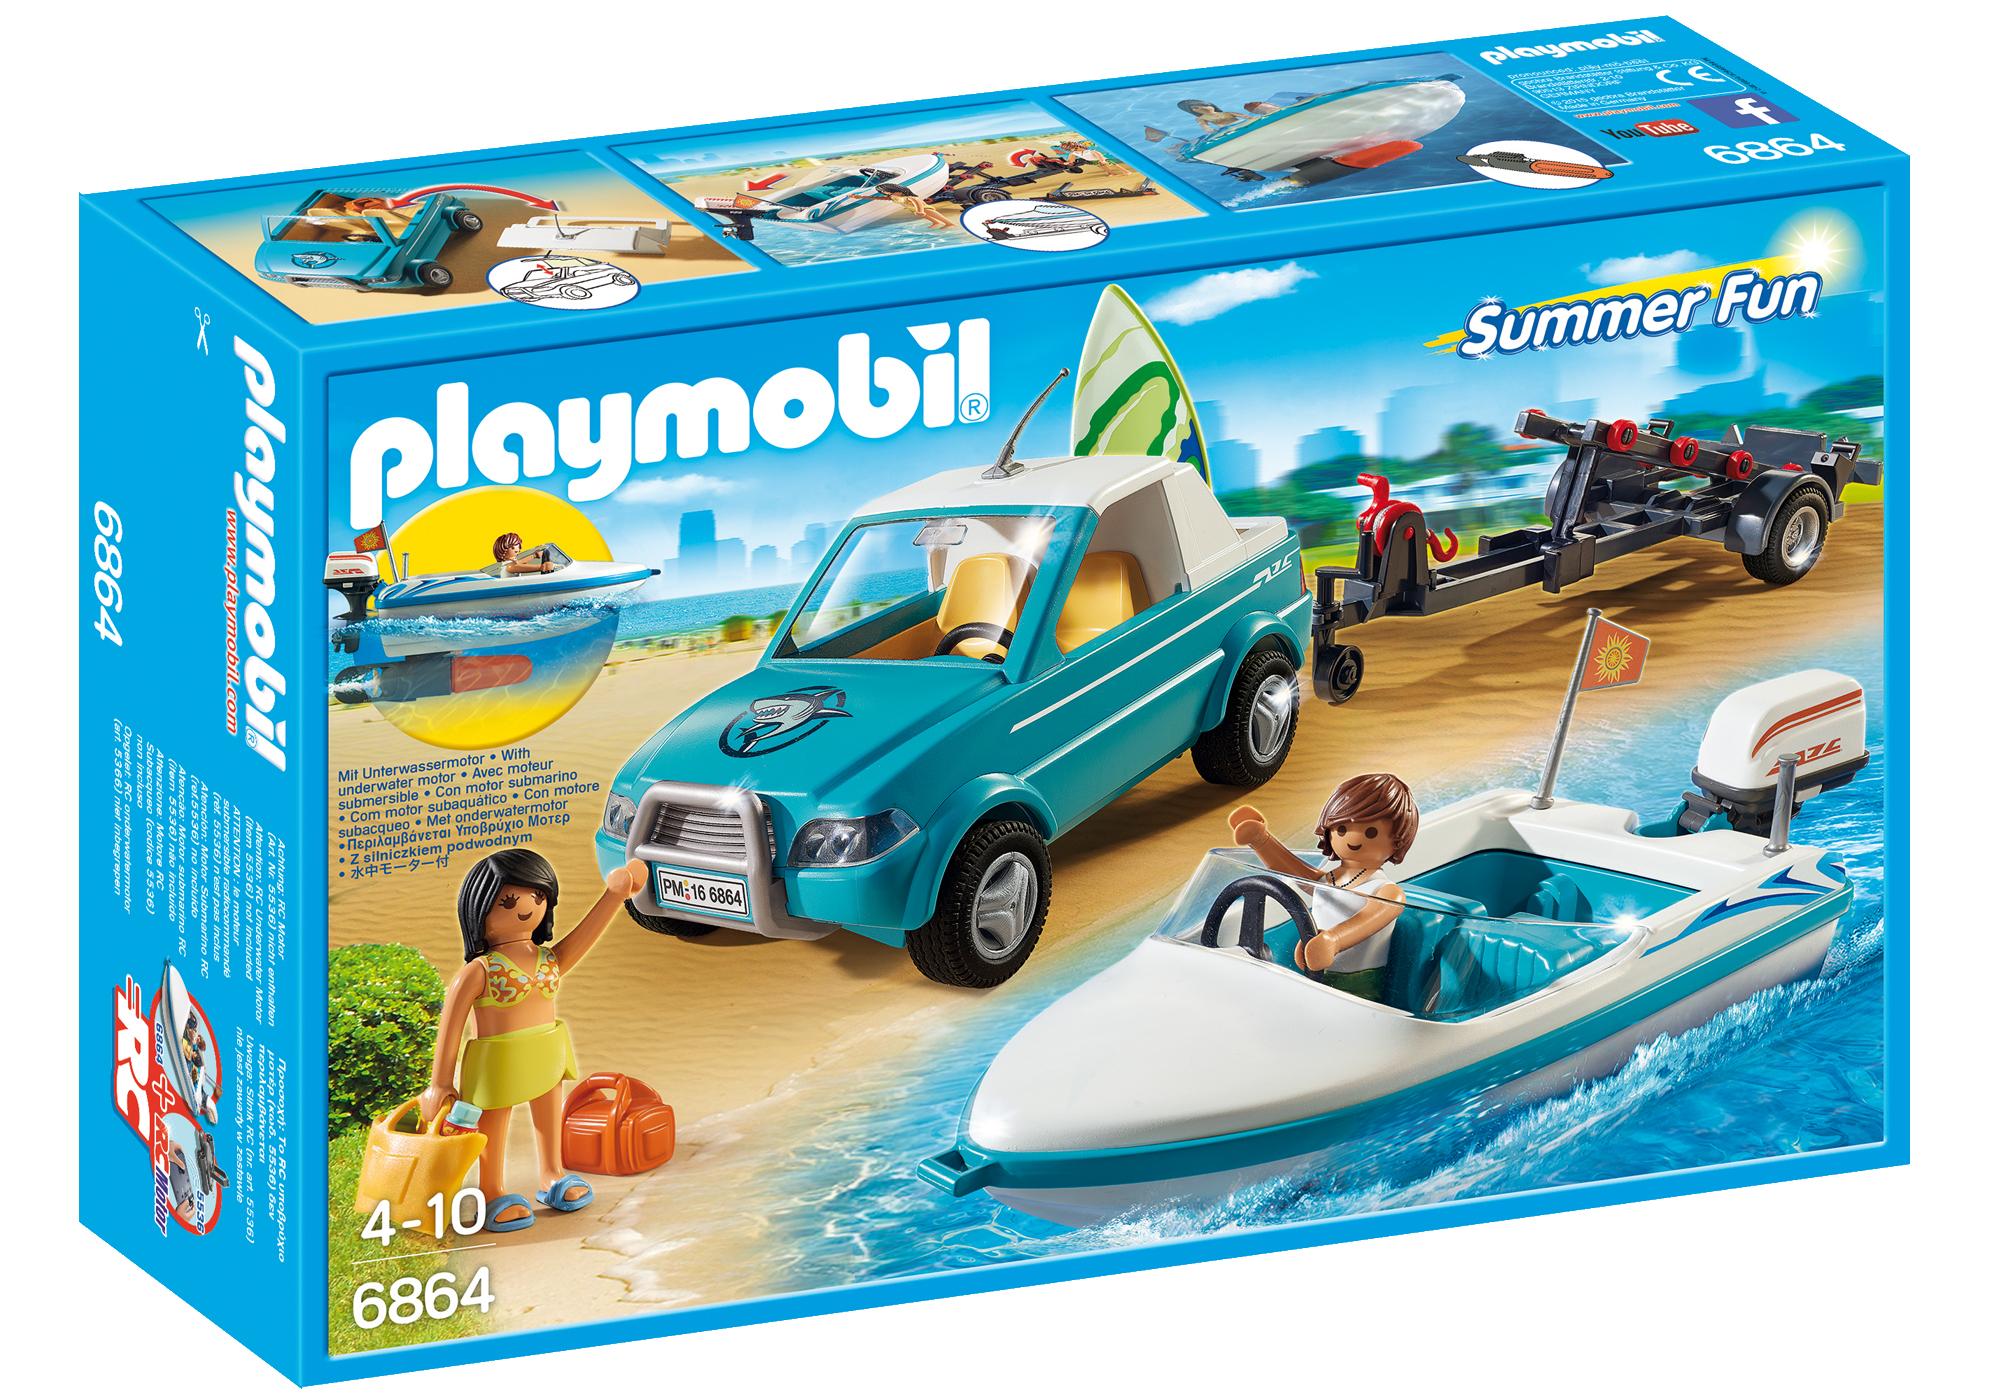 http://media.playmobil.com/i/playmobil/6864_product_box_front/Pick-up met speedboot met onderwatermotor